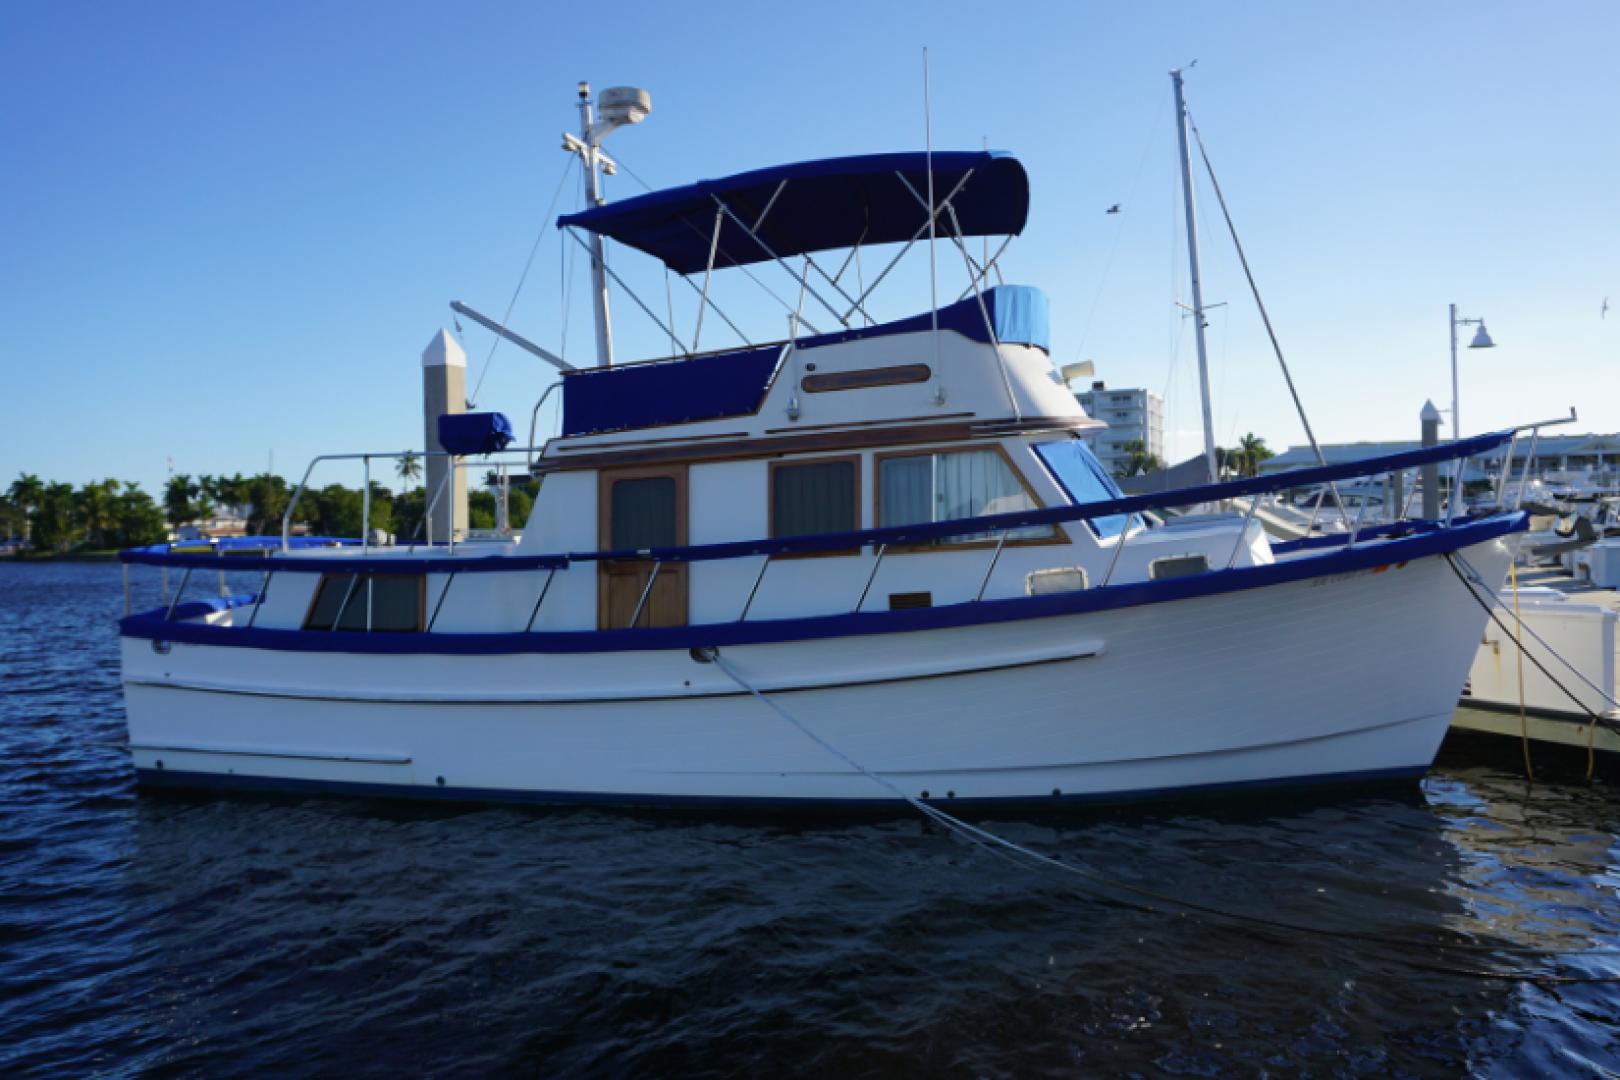 Monk-36 Trawler 1985-In Vino Veritas Naples-Florida-United States-Monk 36 Trawler Profile-1571247 | Thumbnail